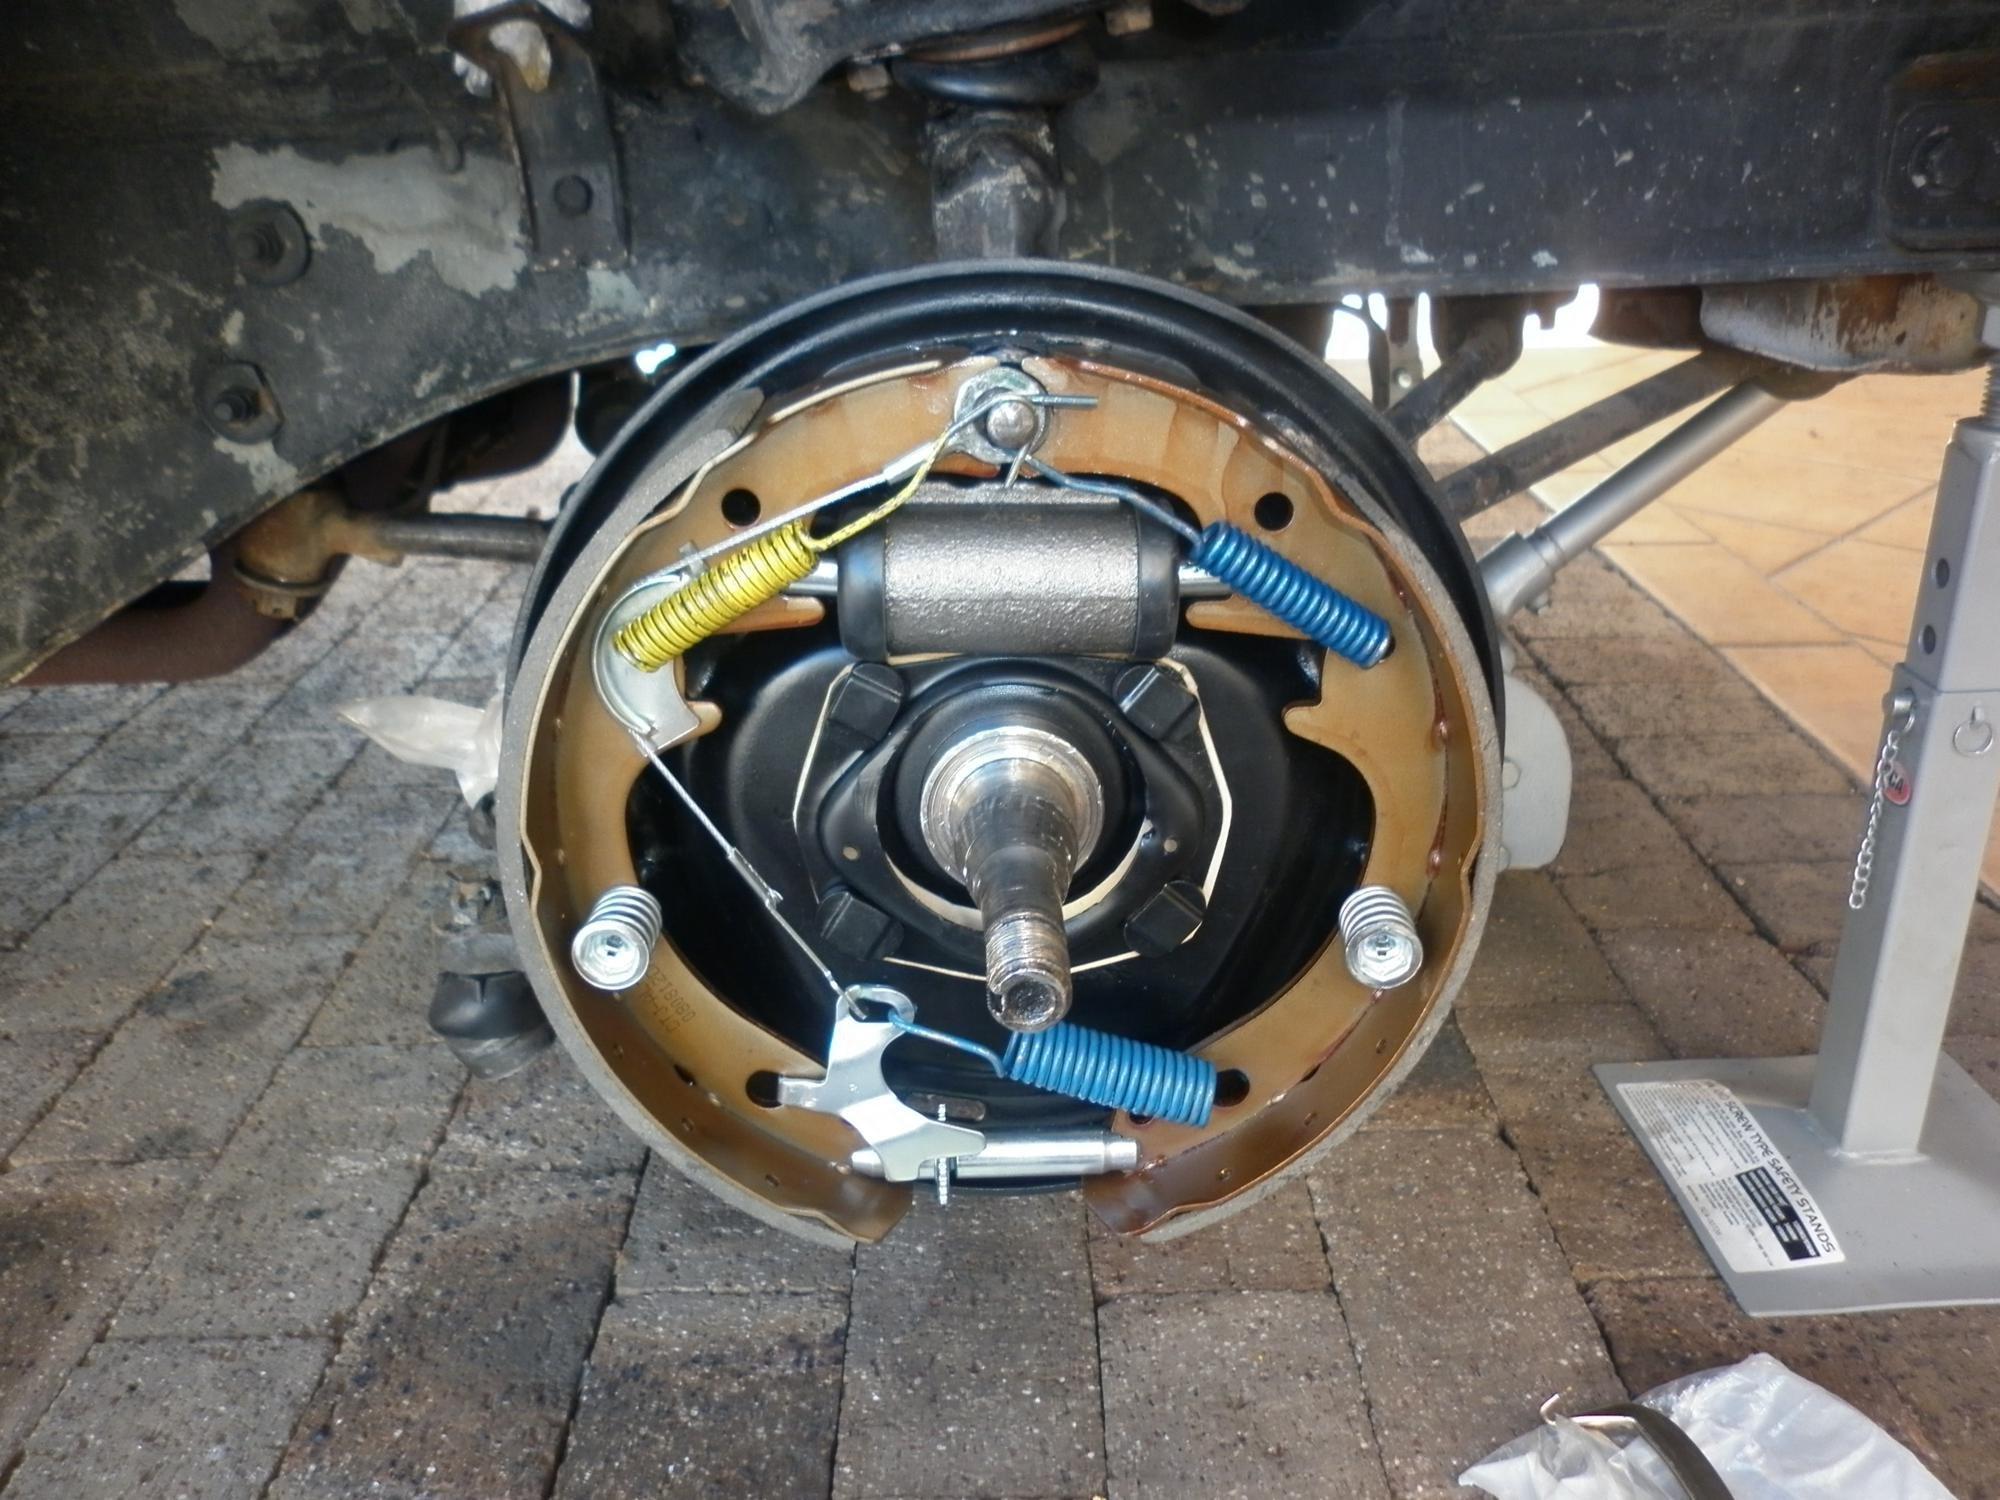 66 Mustang Drum Brake Rebuild My Progress So Far Ford